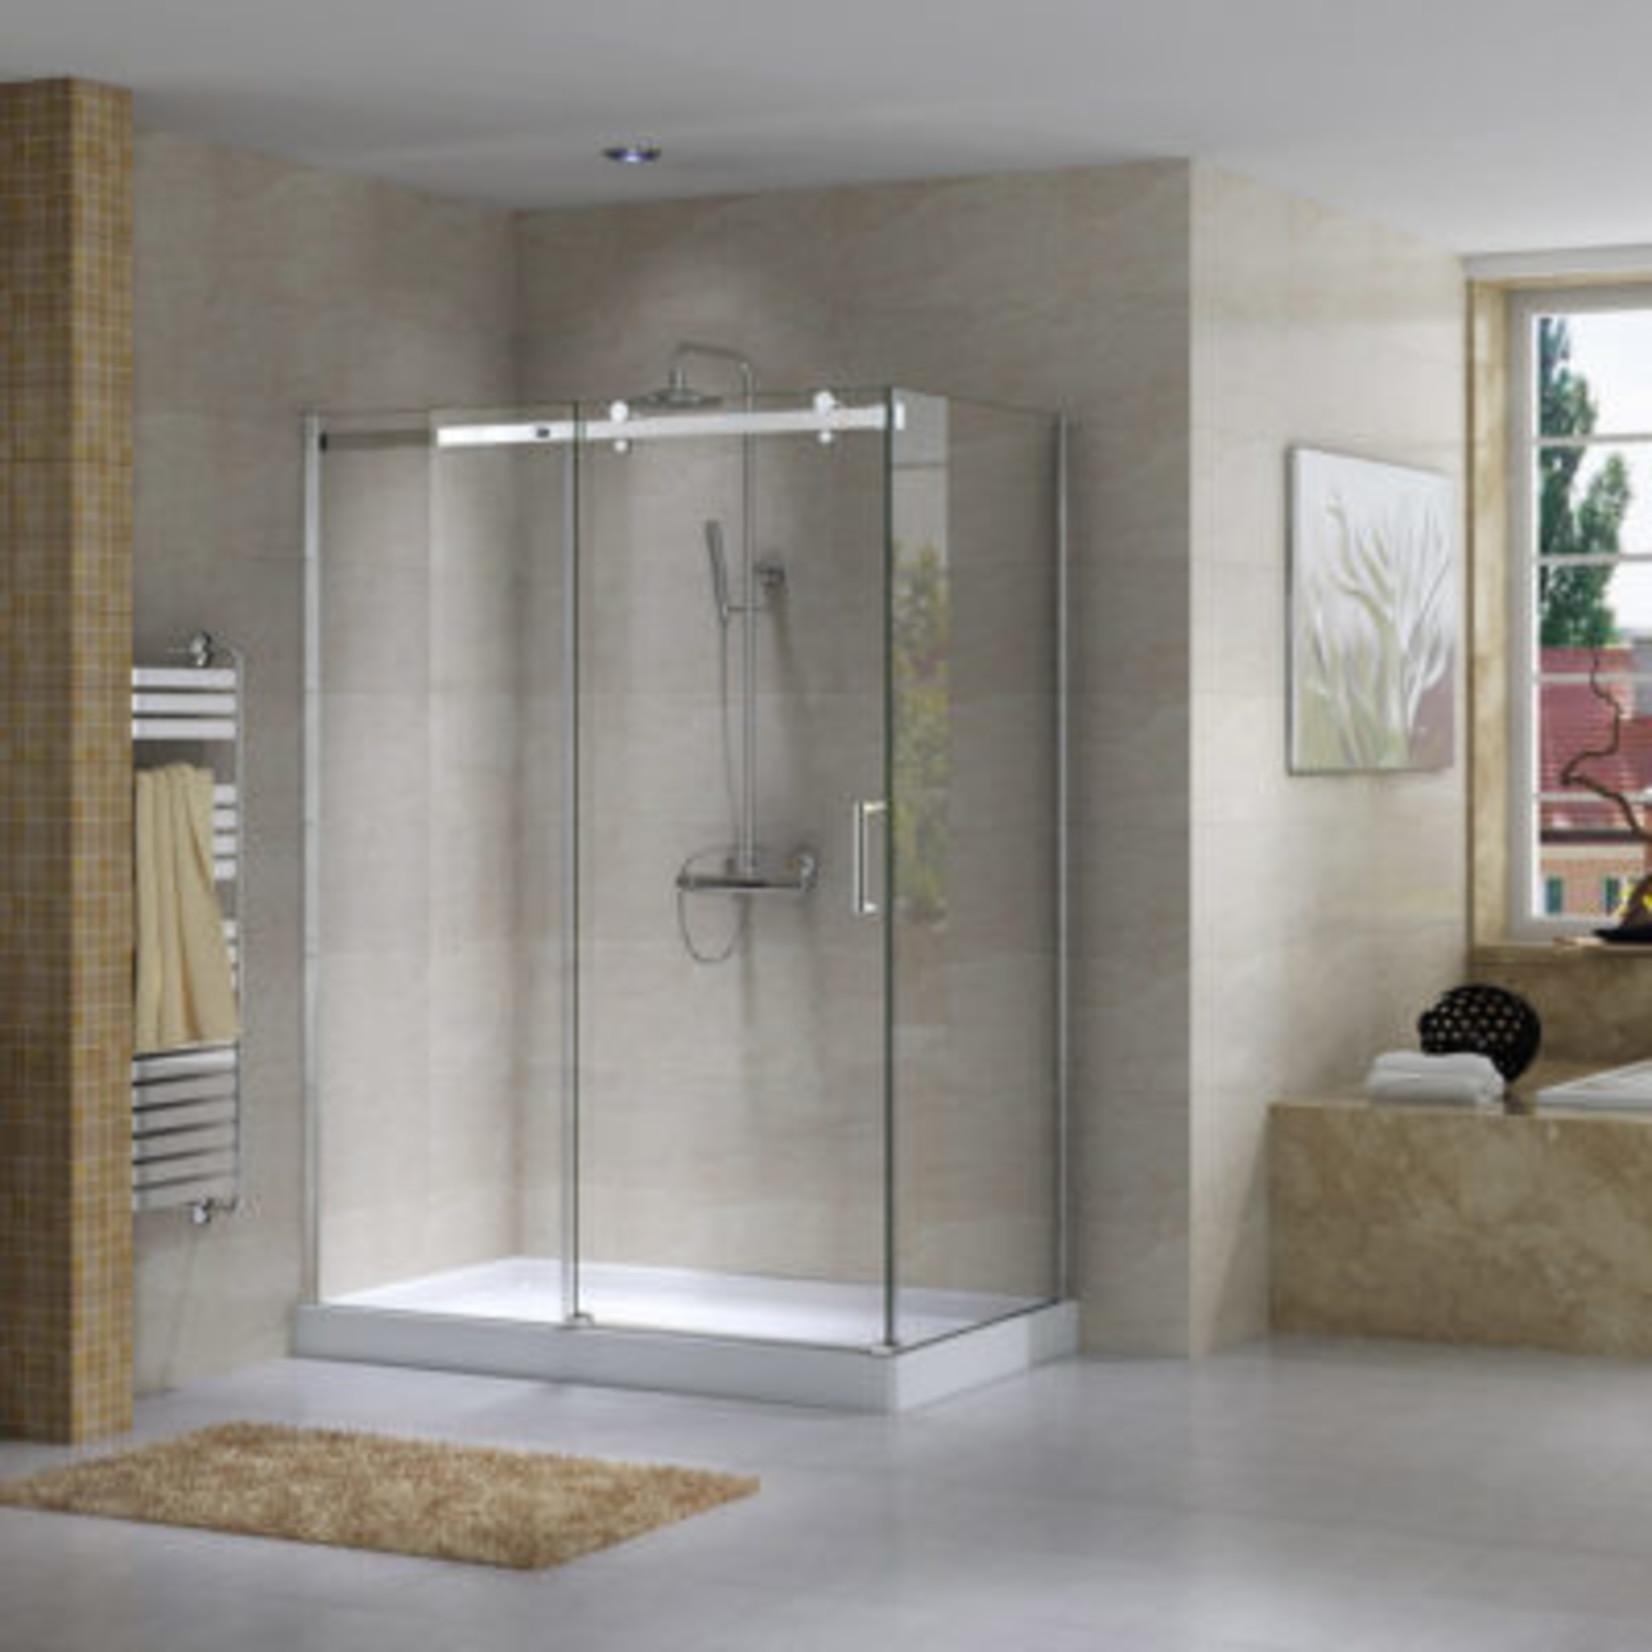 Reversible shower set 36x72 chrome Quartz Jade series